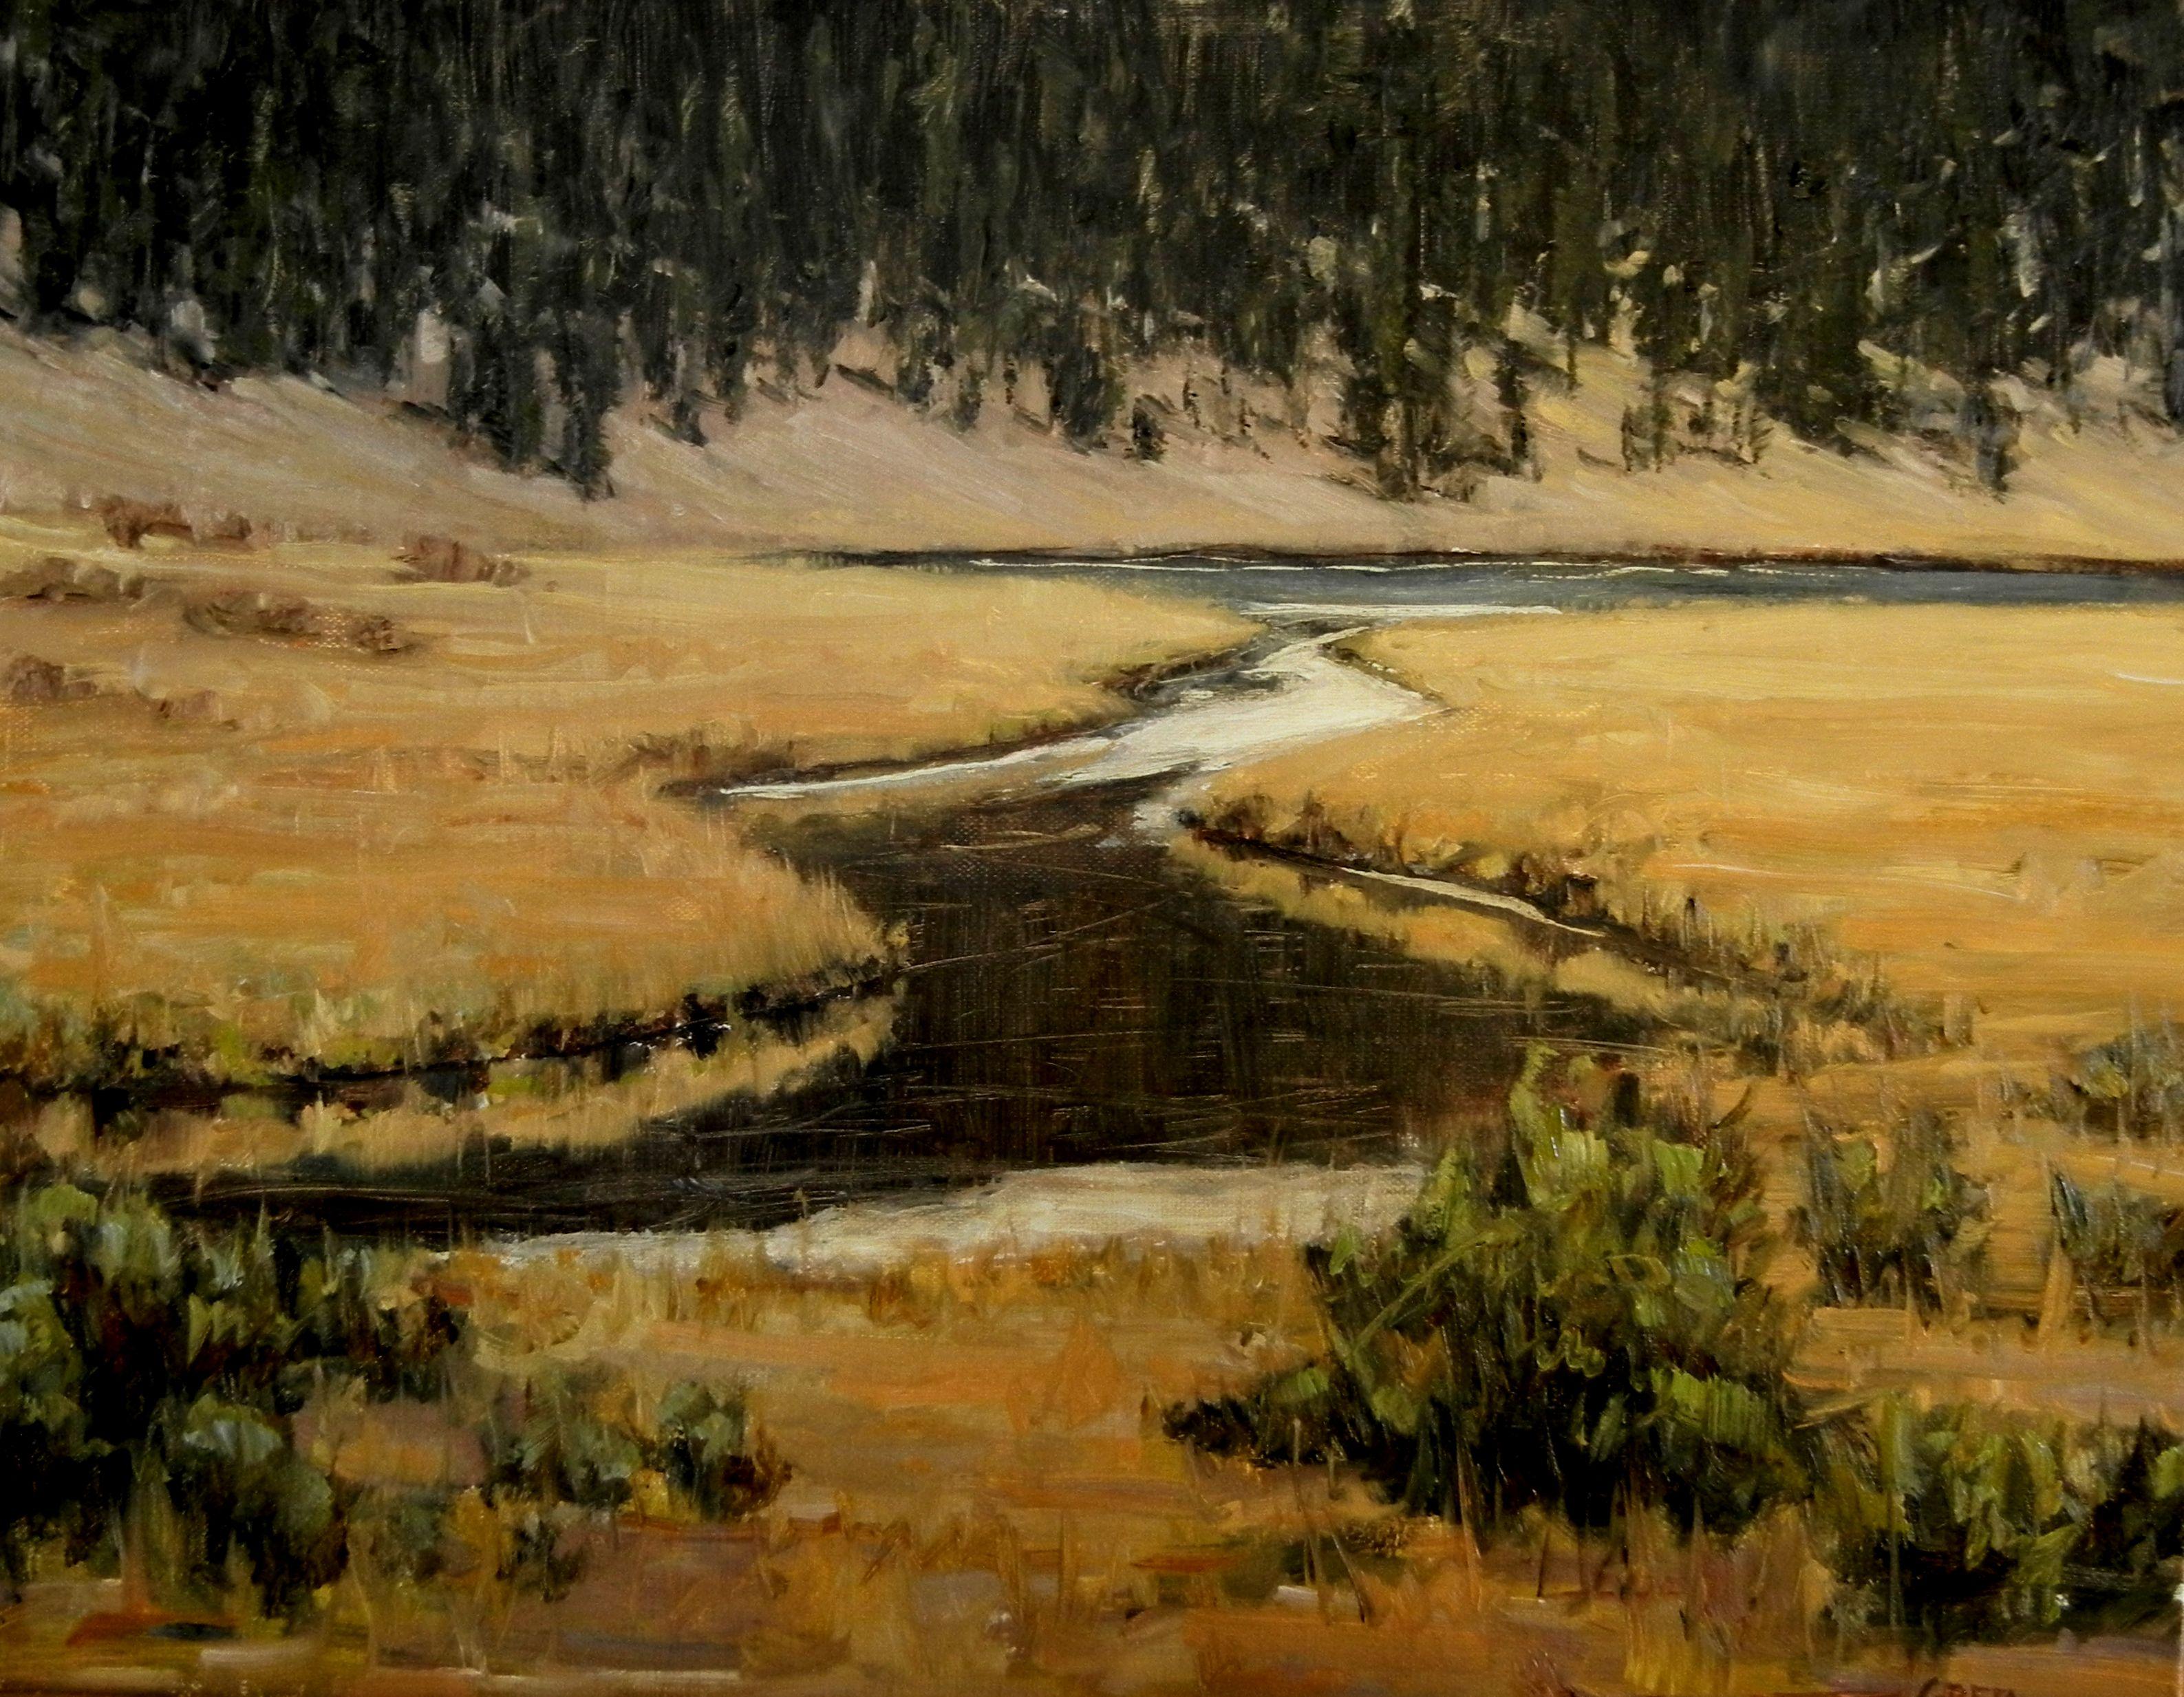 Calm Water by Greta Balzer | ArtworkNetwork.com